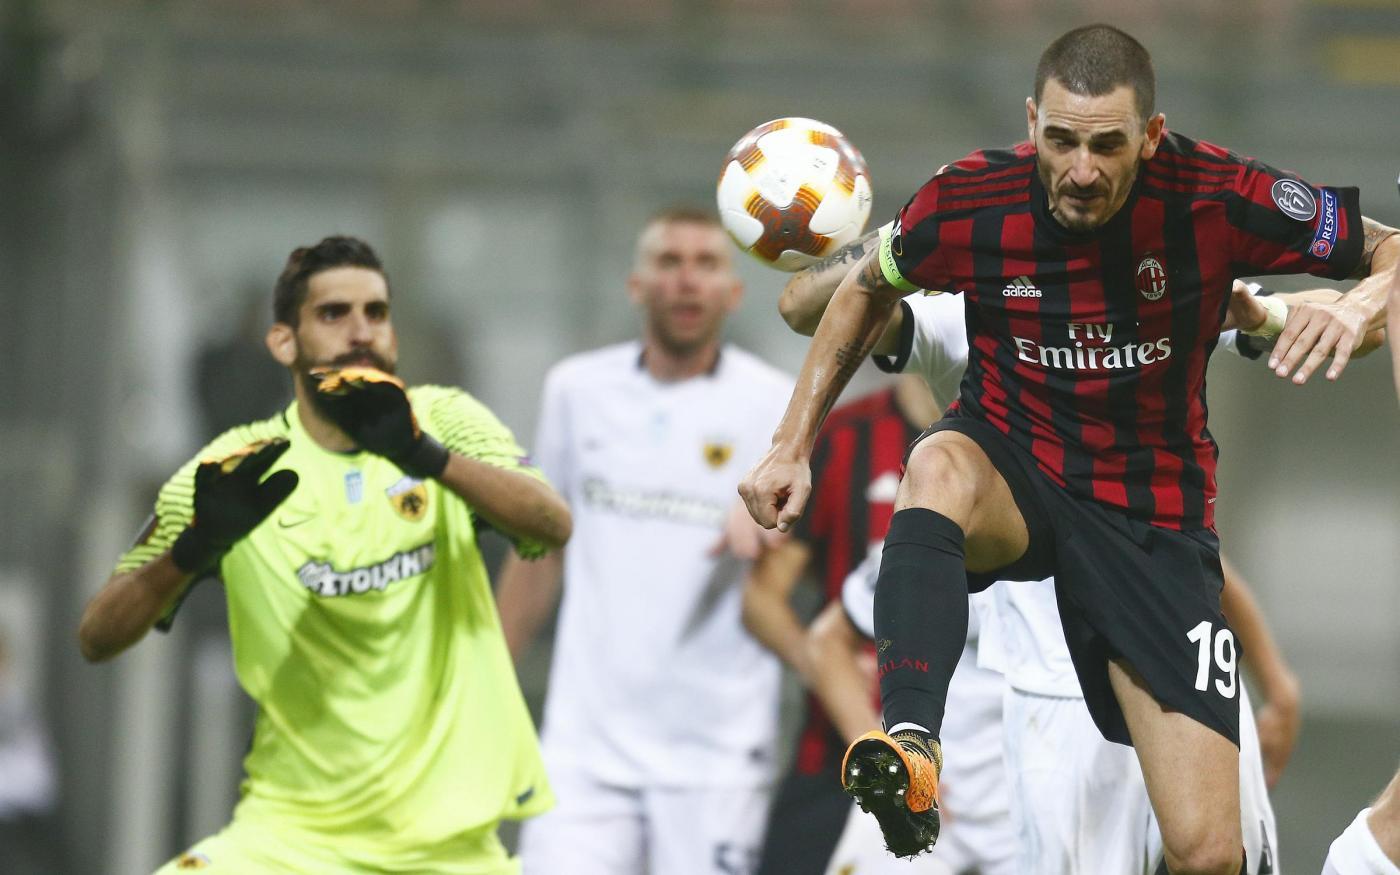 Milan-AEK Atene, Livaja: